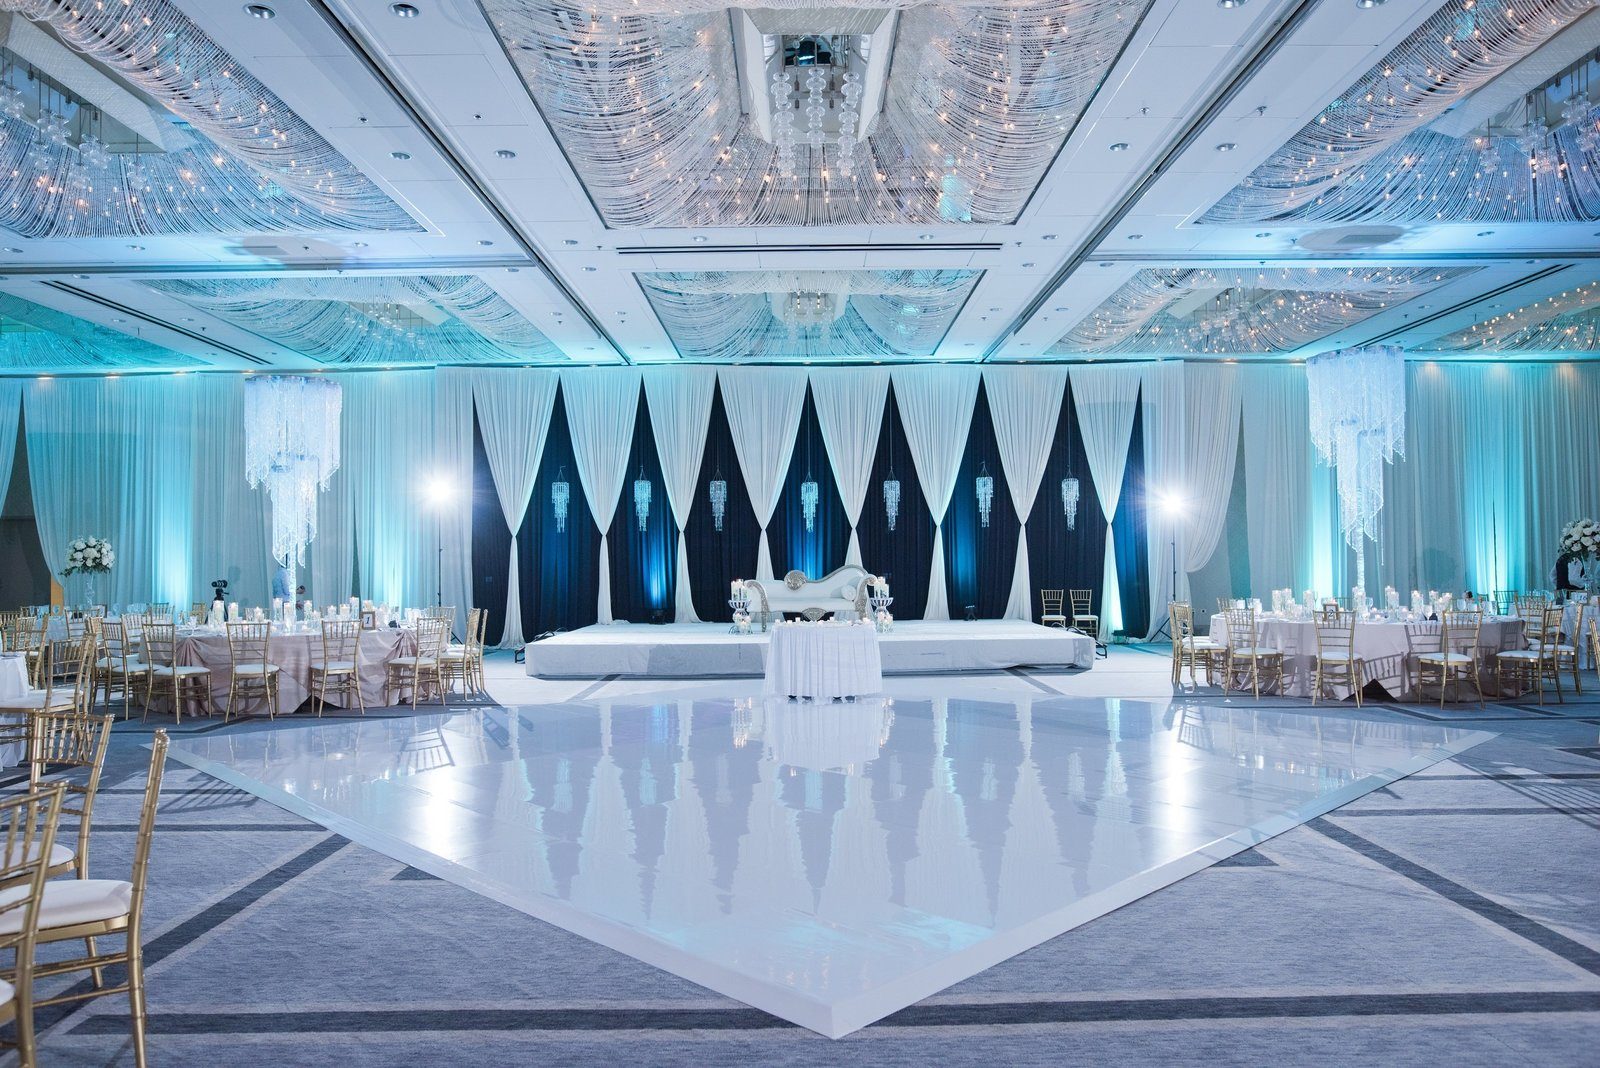 sarju-resha-wedding-reception-0026